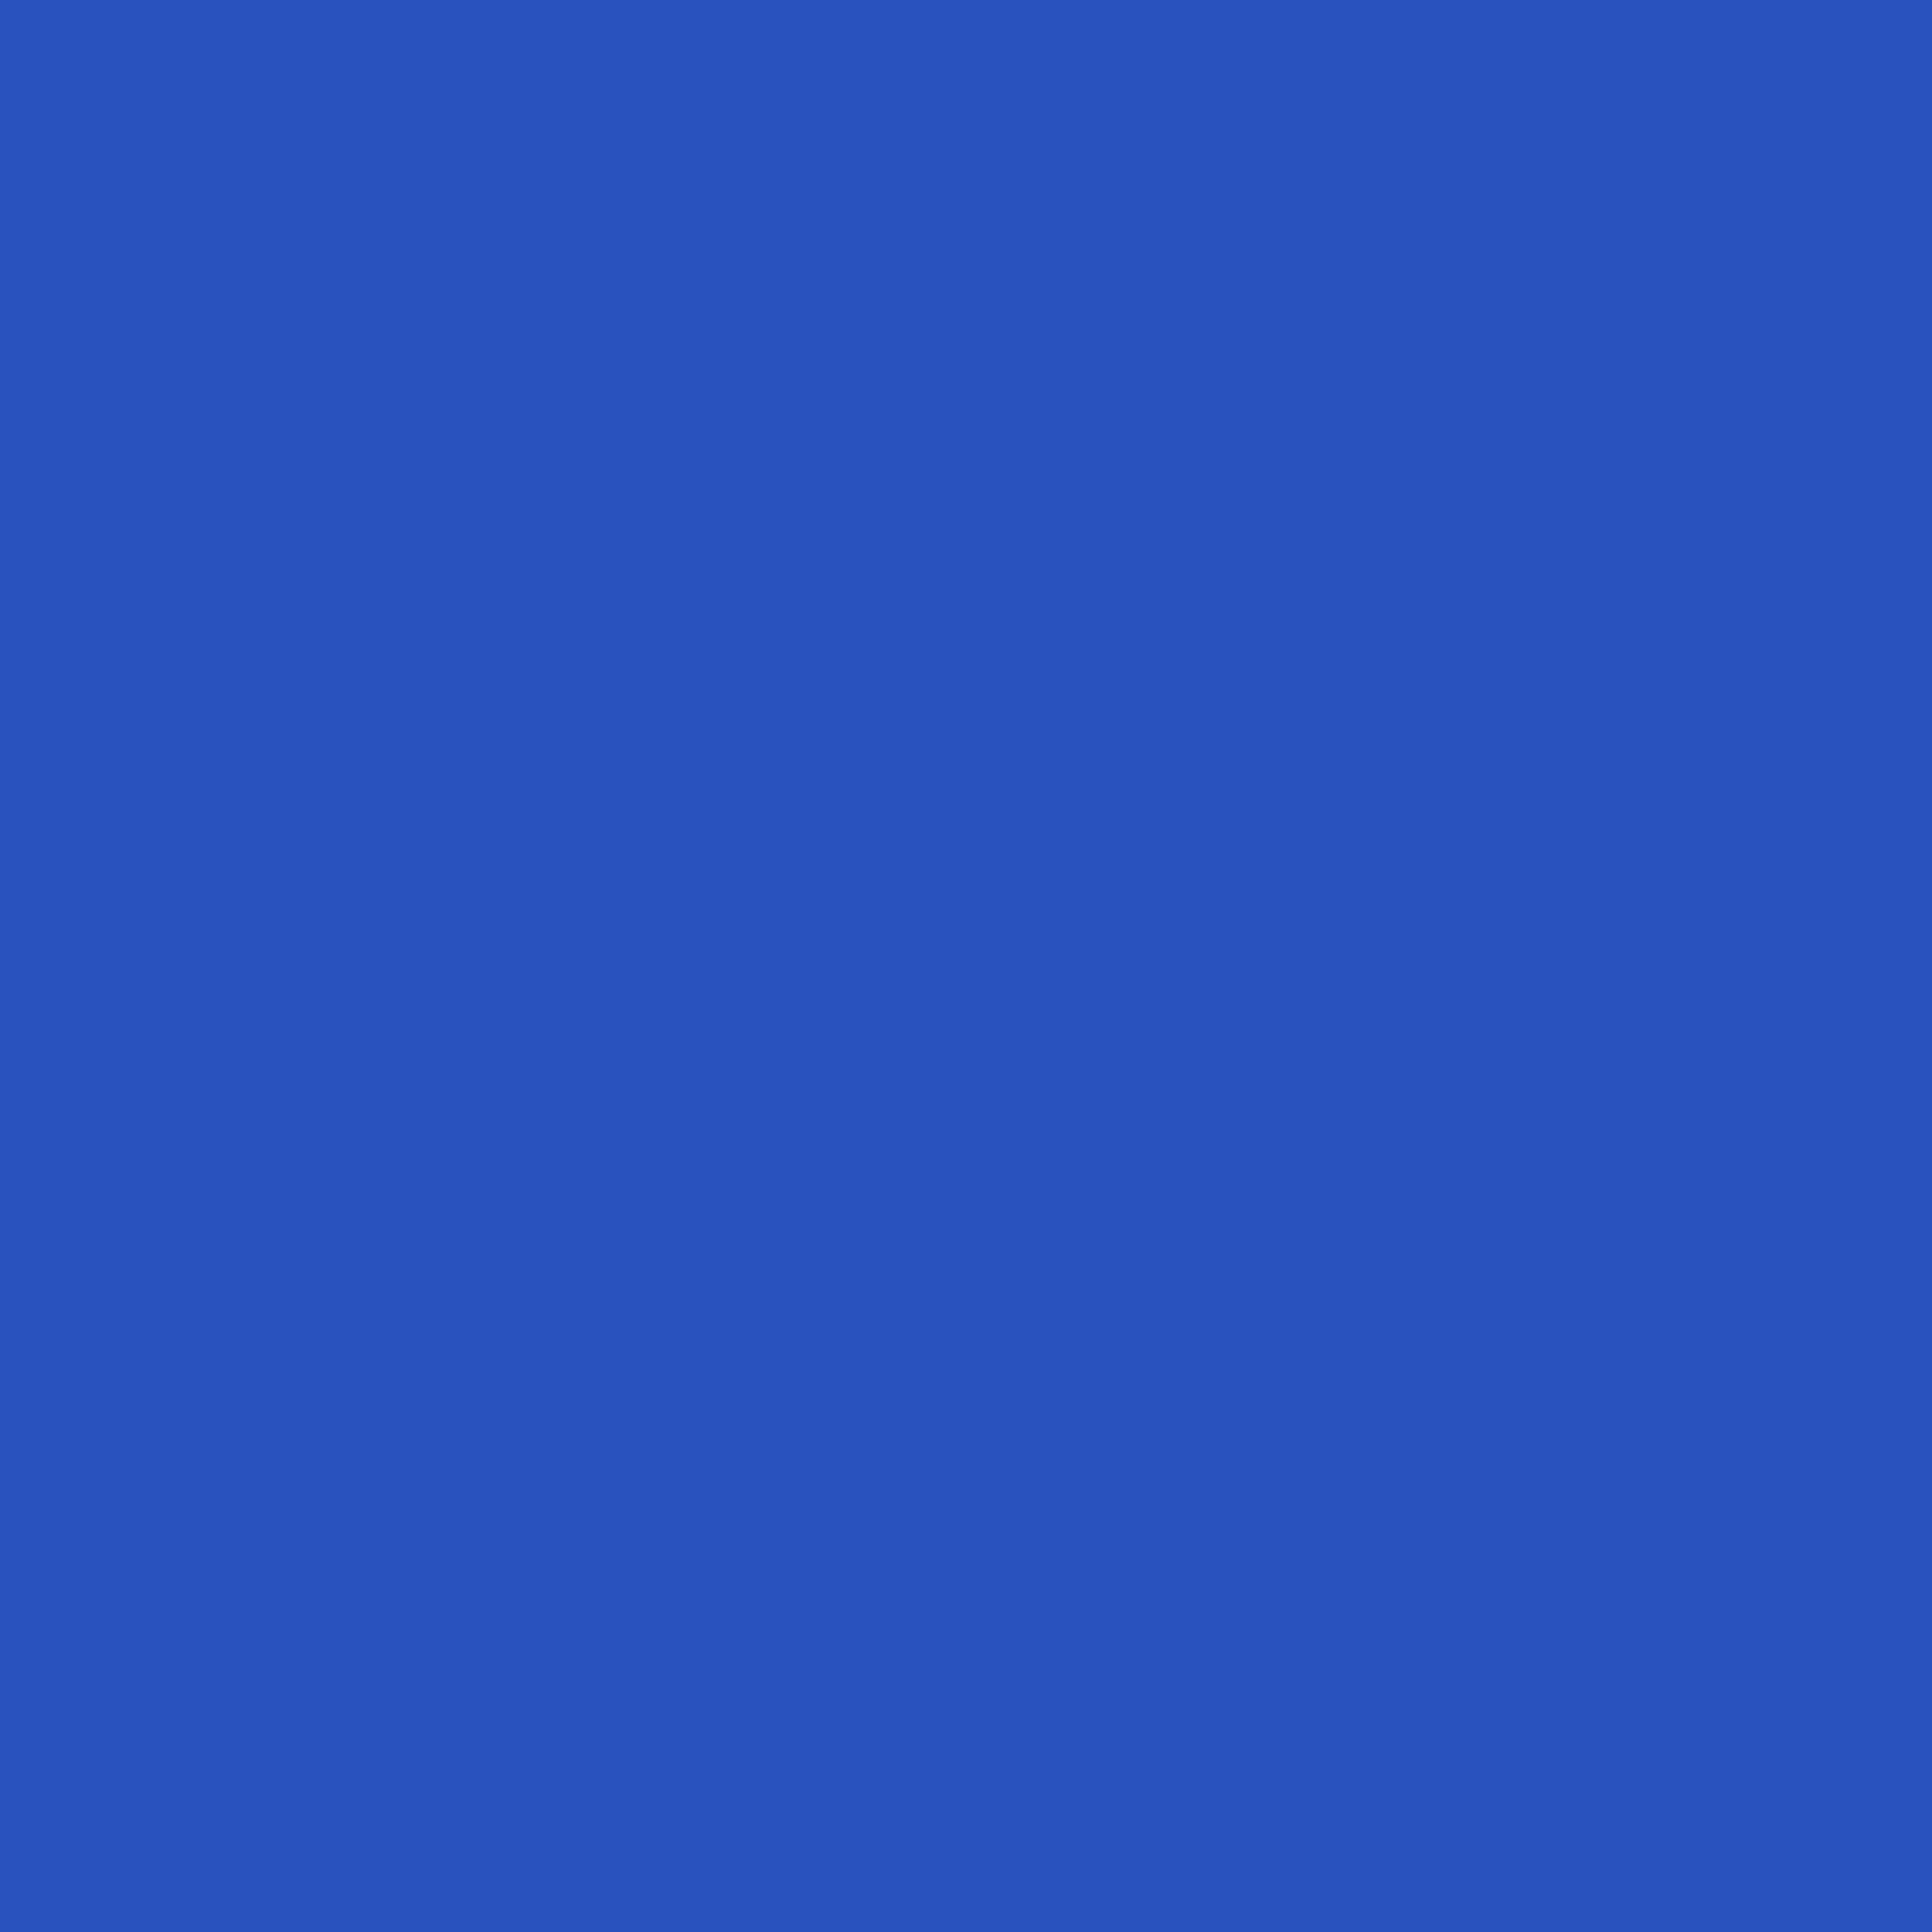 3600x3600 Cerulean Blue Solid Color Background